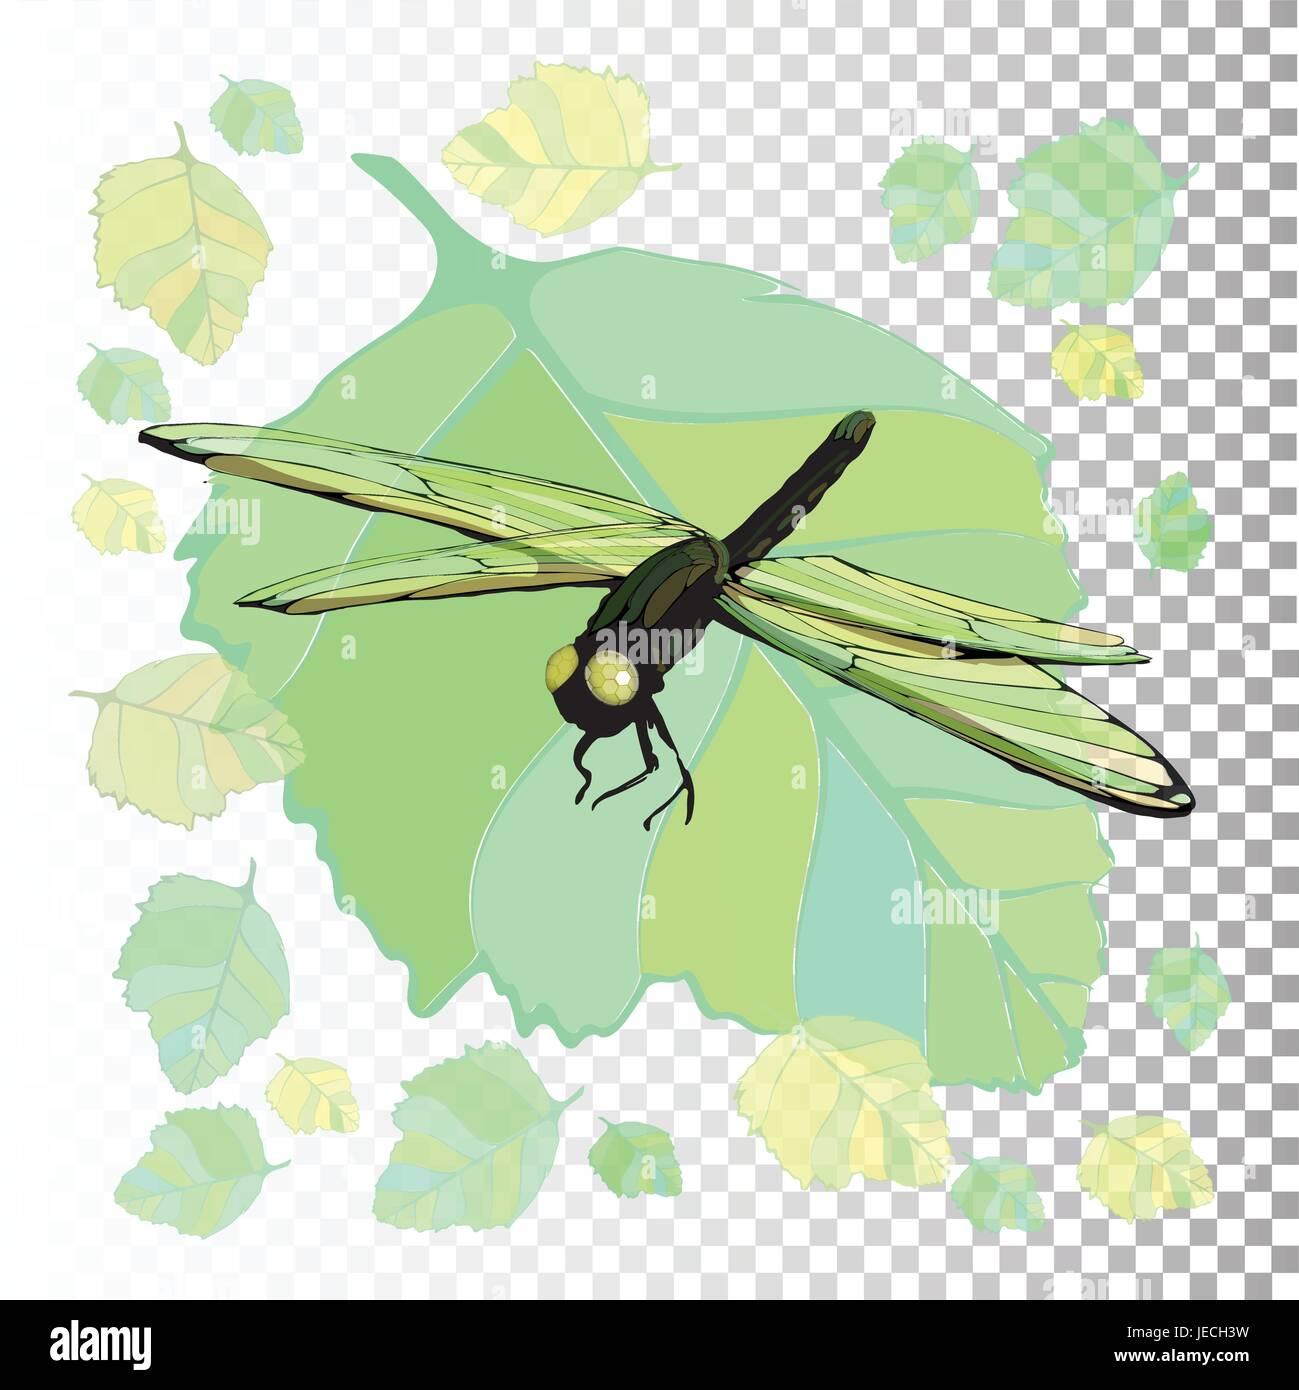 Dragonfly Symbol Of Summer Illustration On Isolated Background